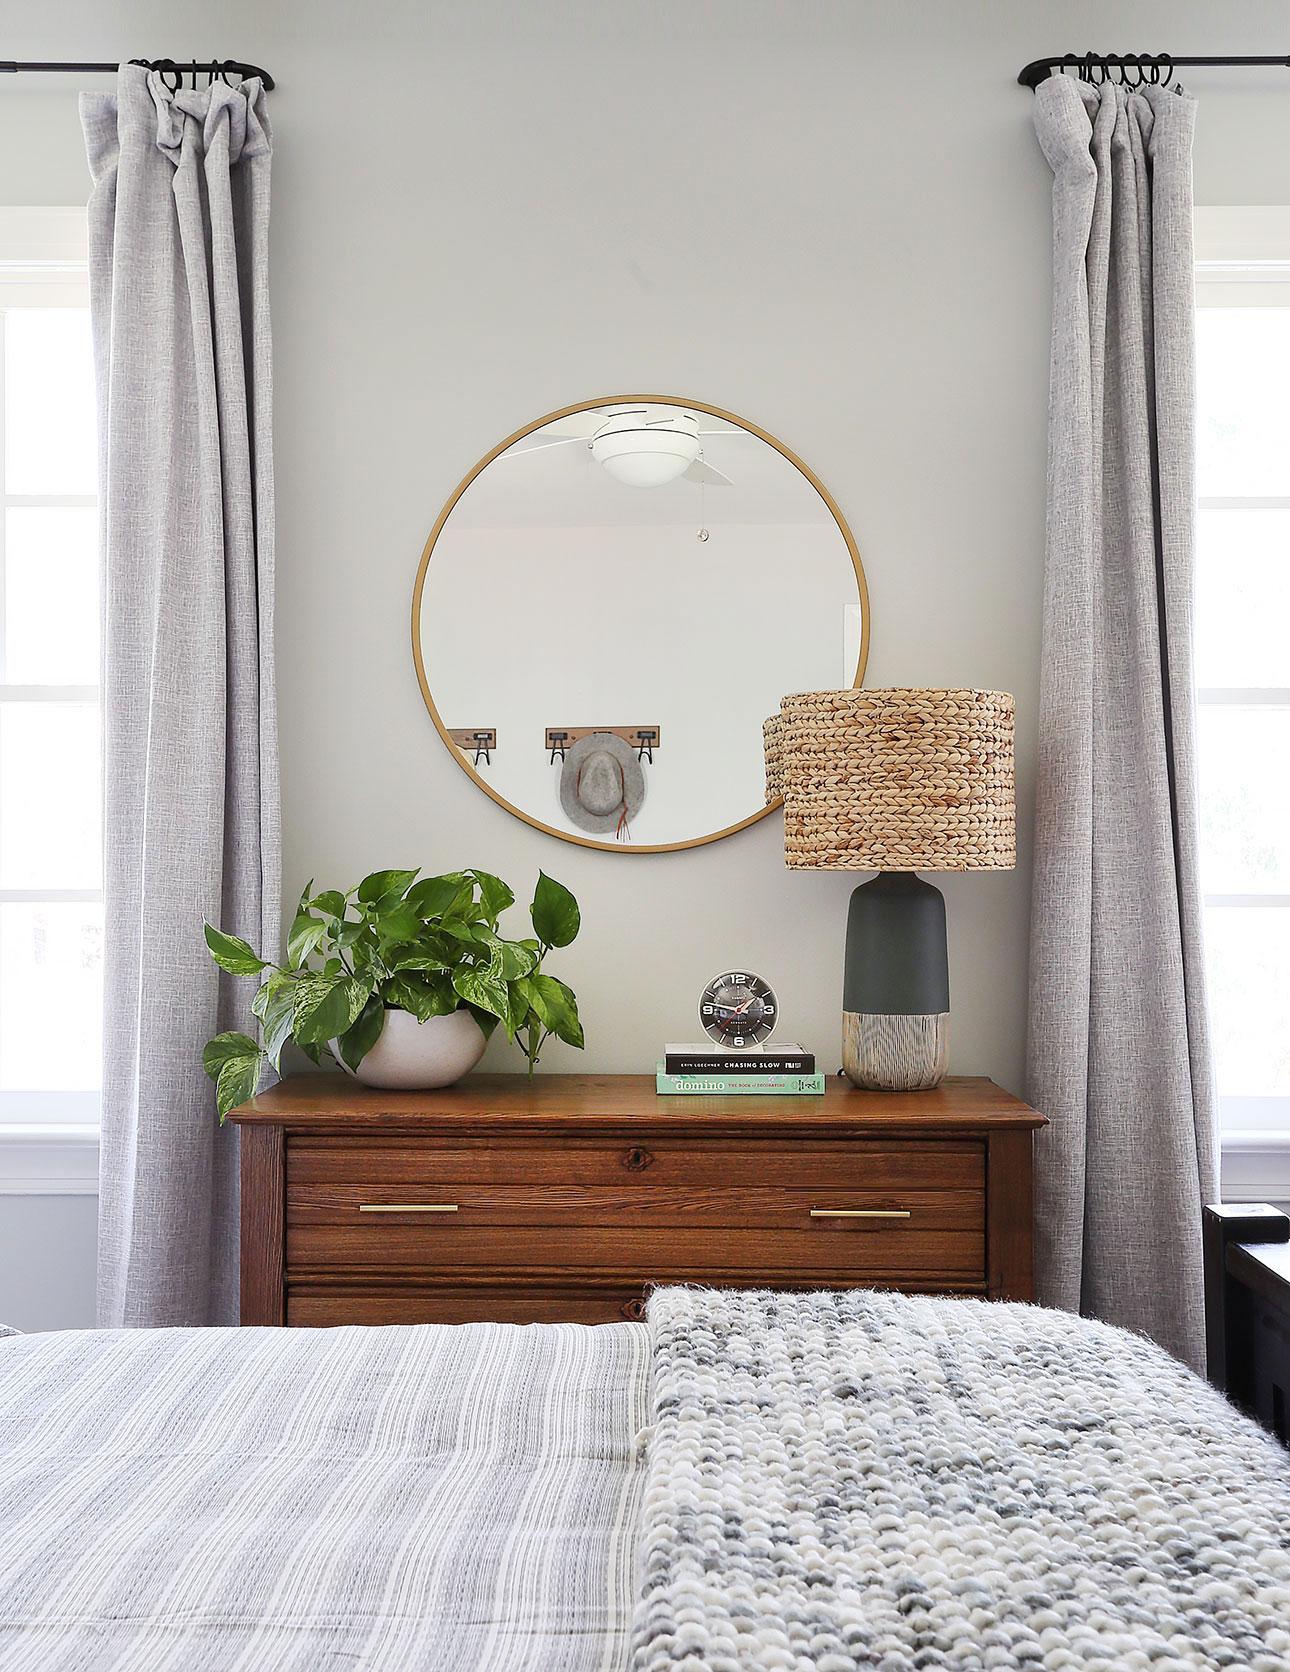 mirror   /   curtain panels   /   drapery rod   /   planter   /   lamp base   /   lamp shade   /   brass pulls   /   throw